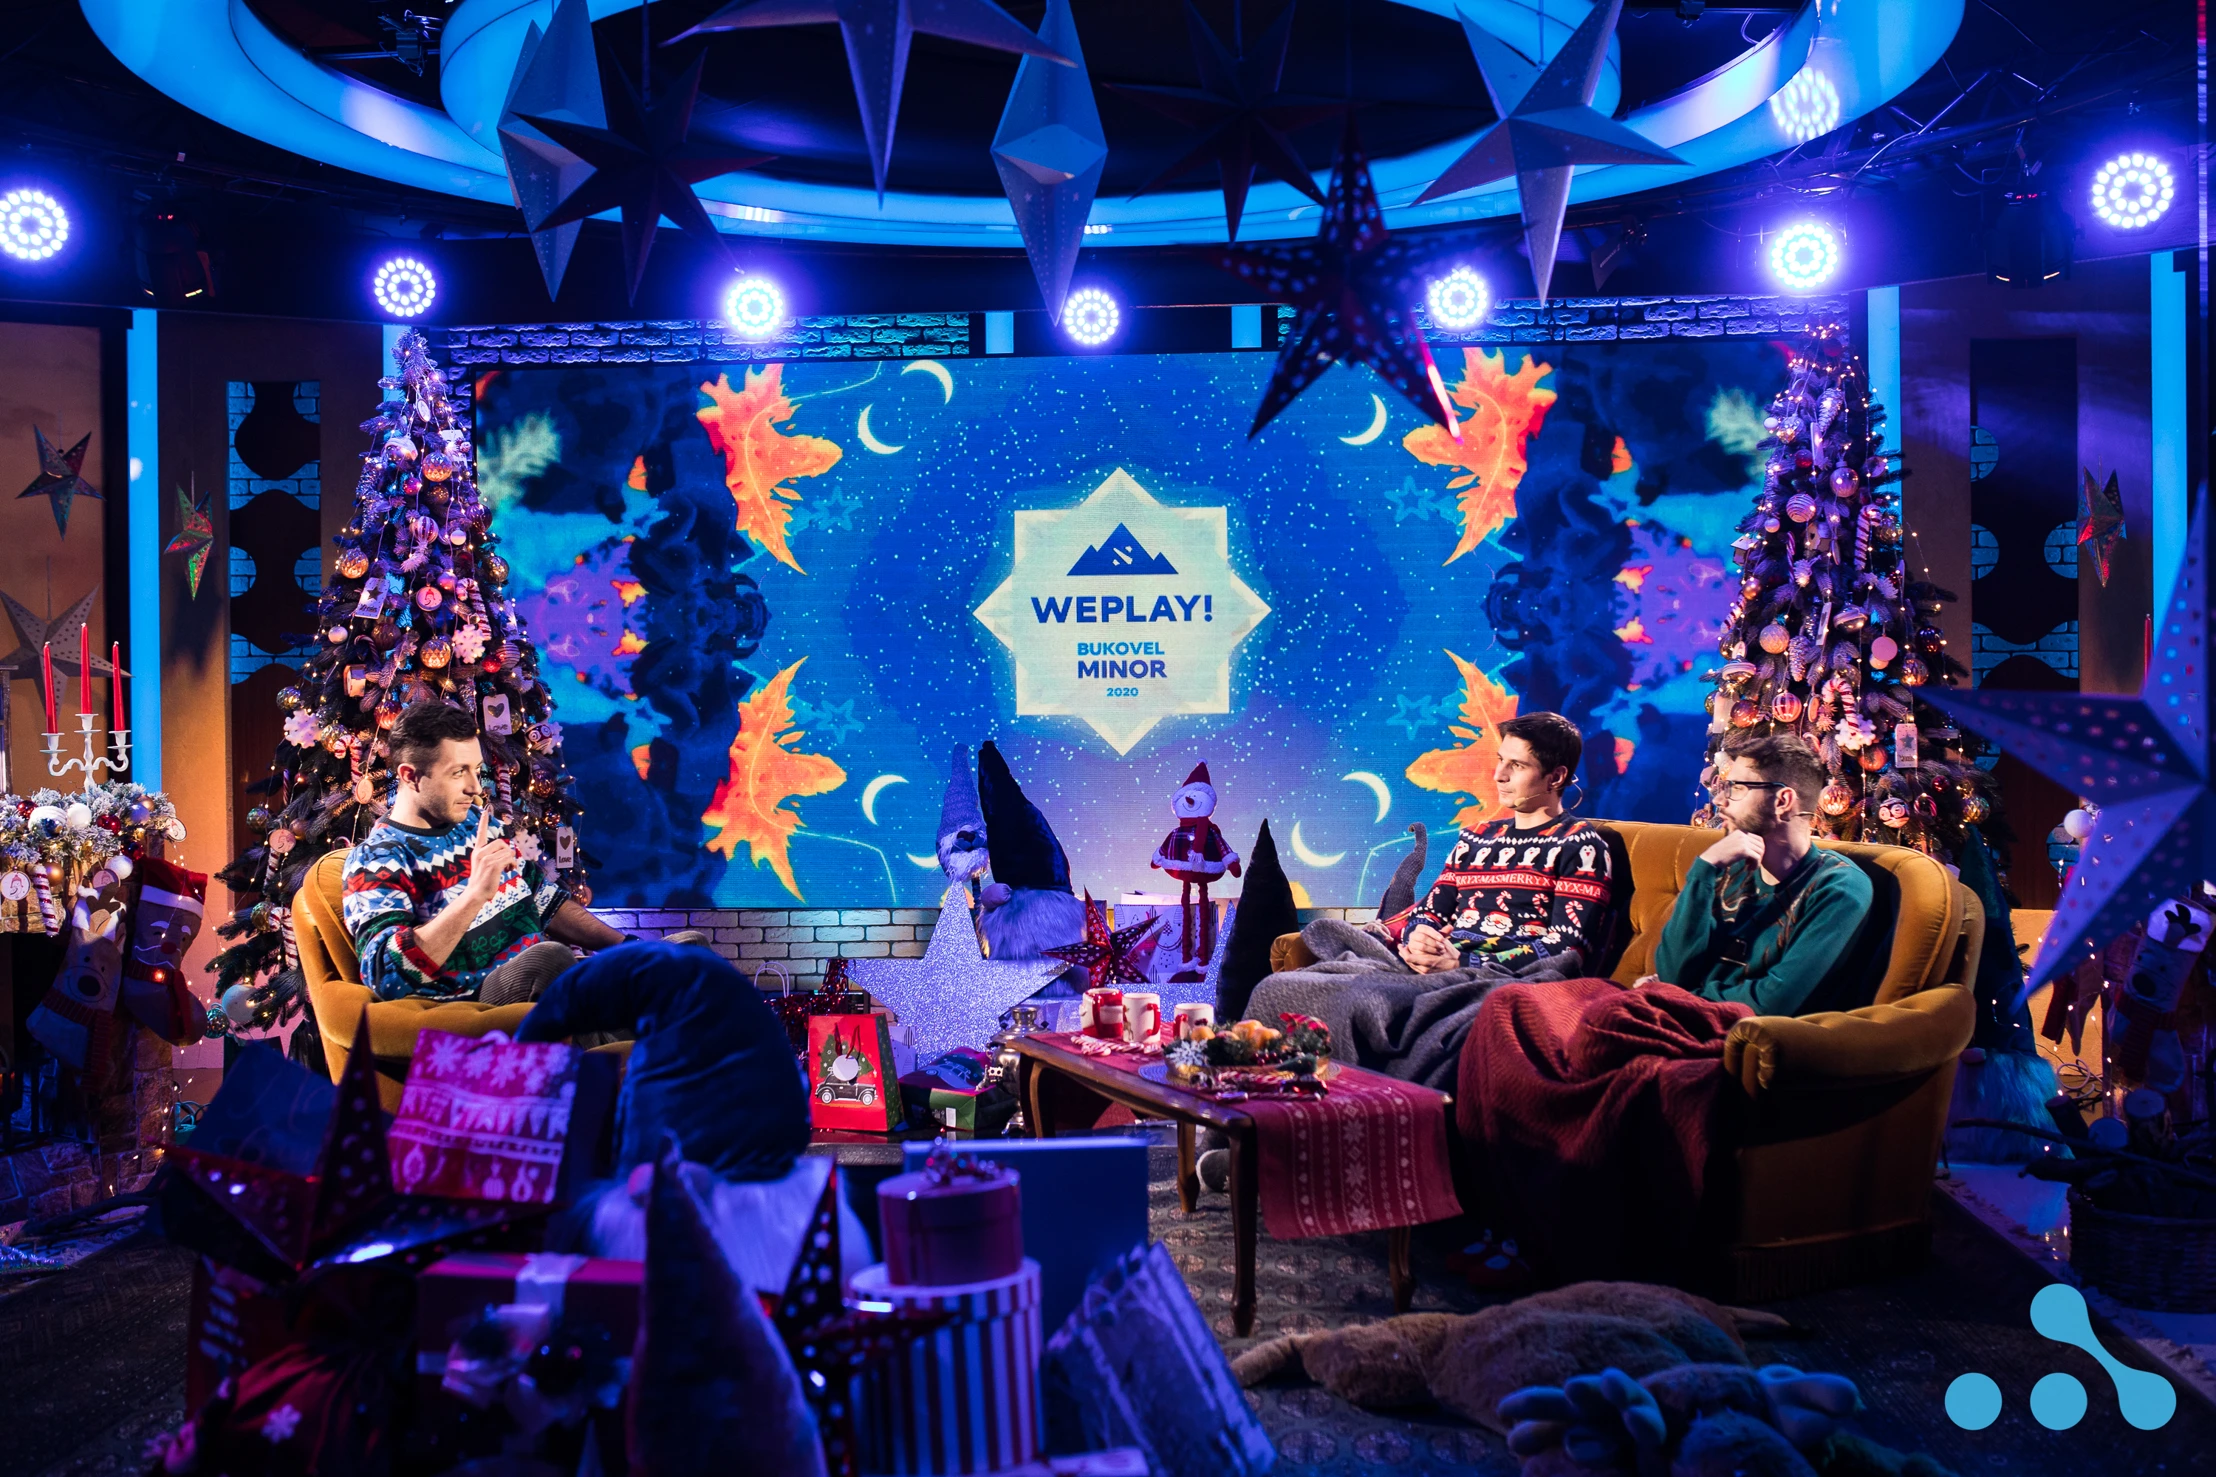 WePlay! Bukovel Minor 2020 Studio Setup for the Regional Qualifiers